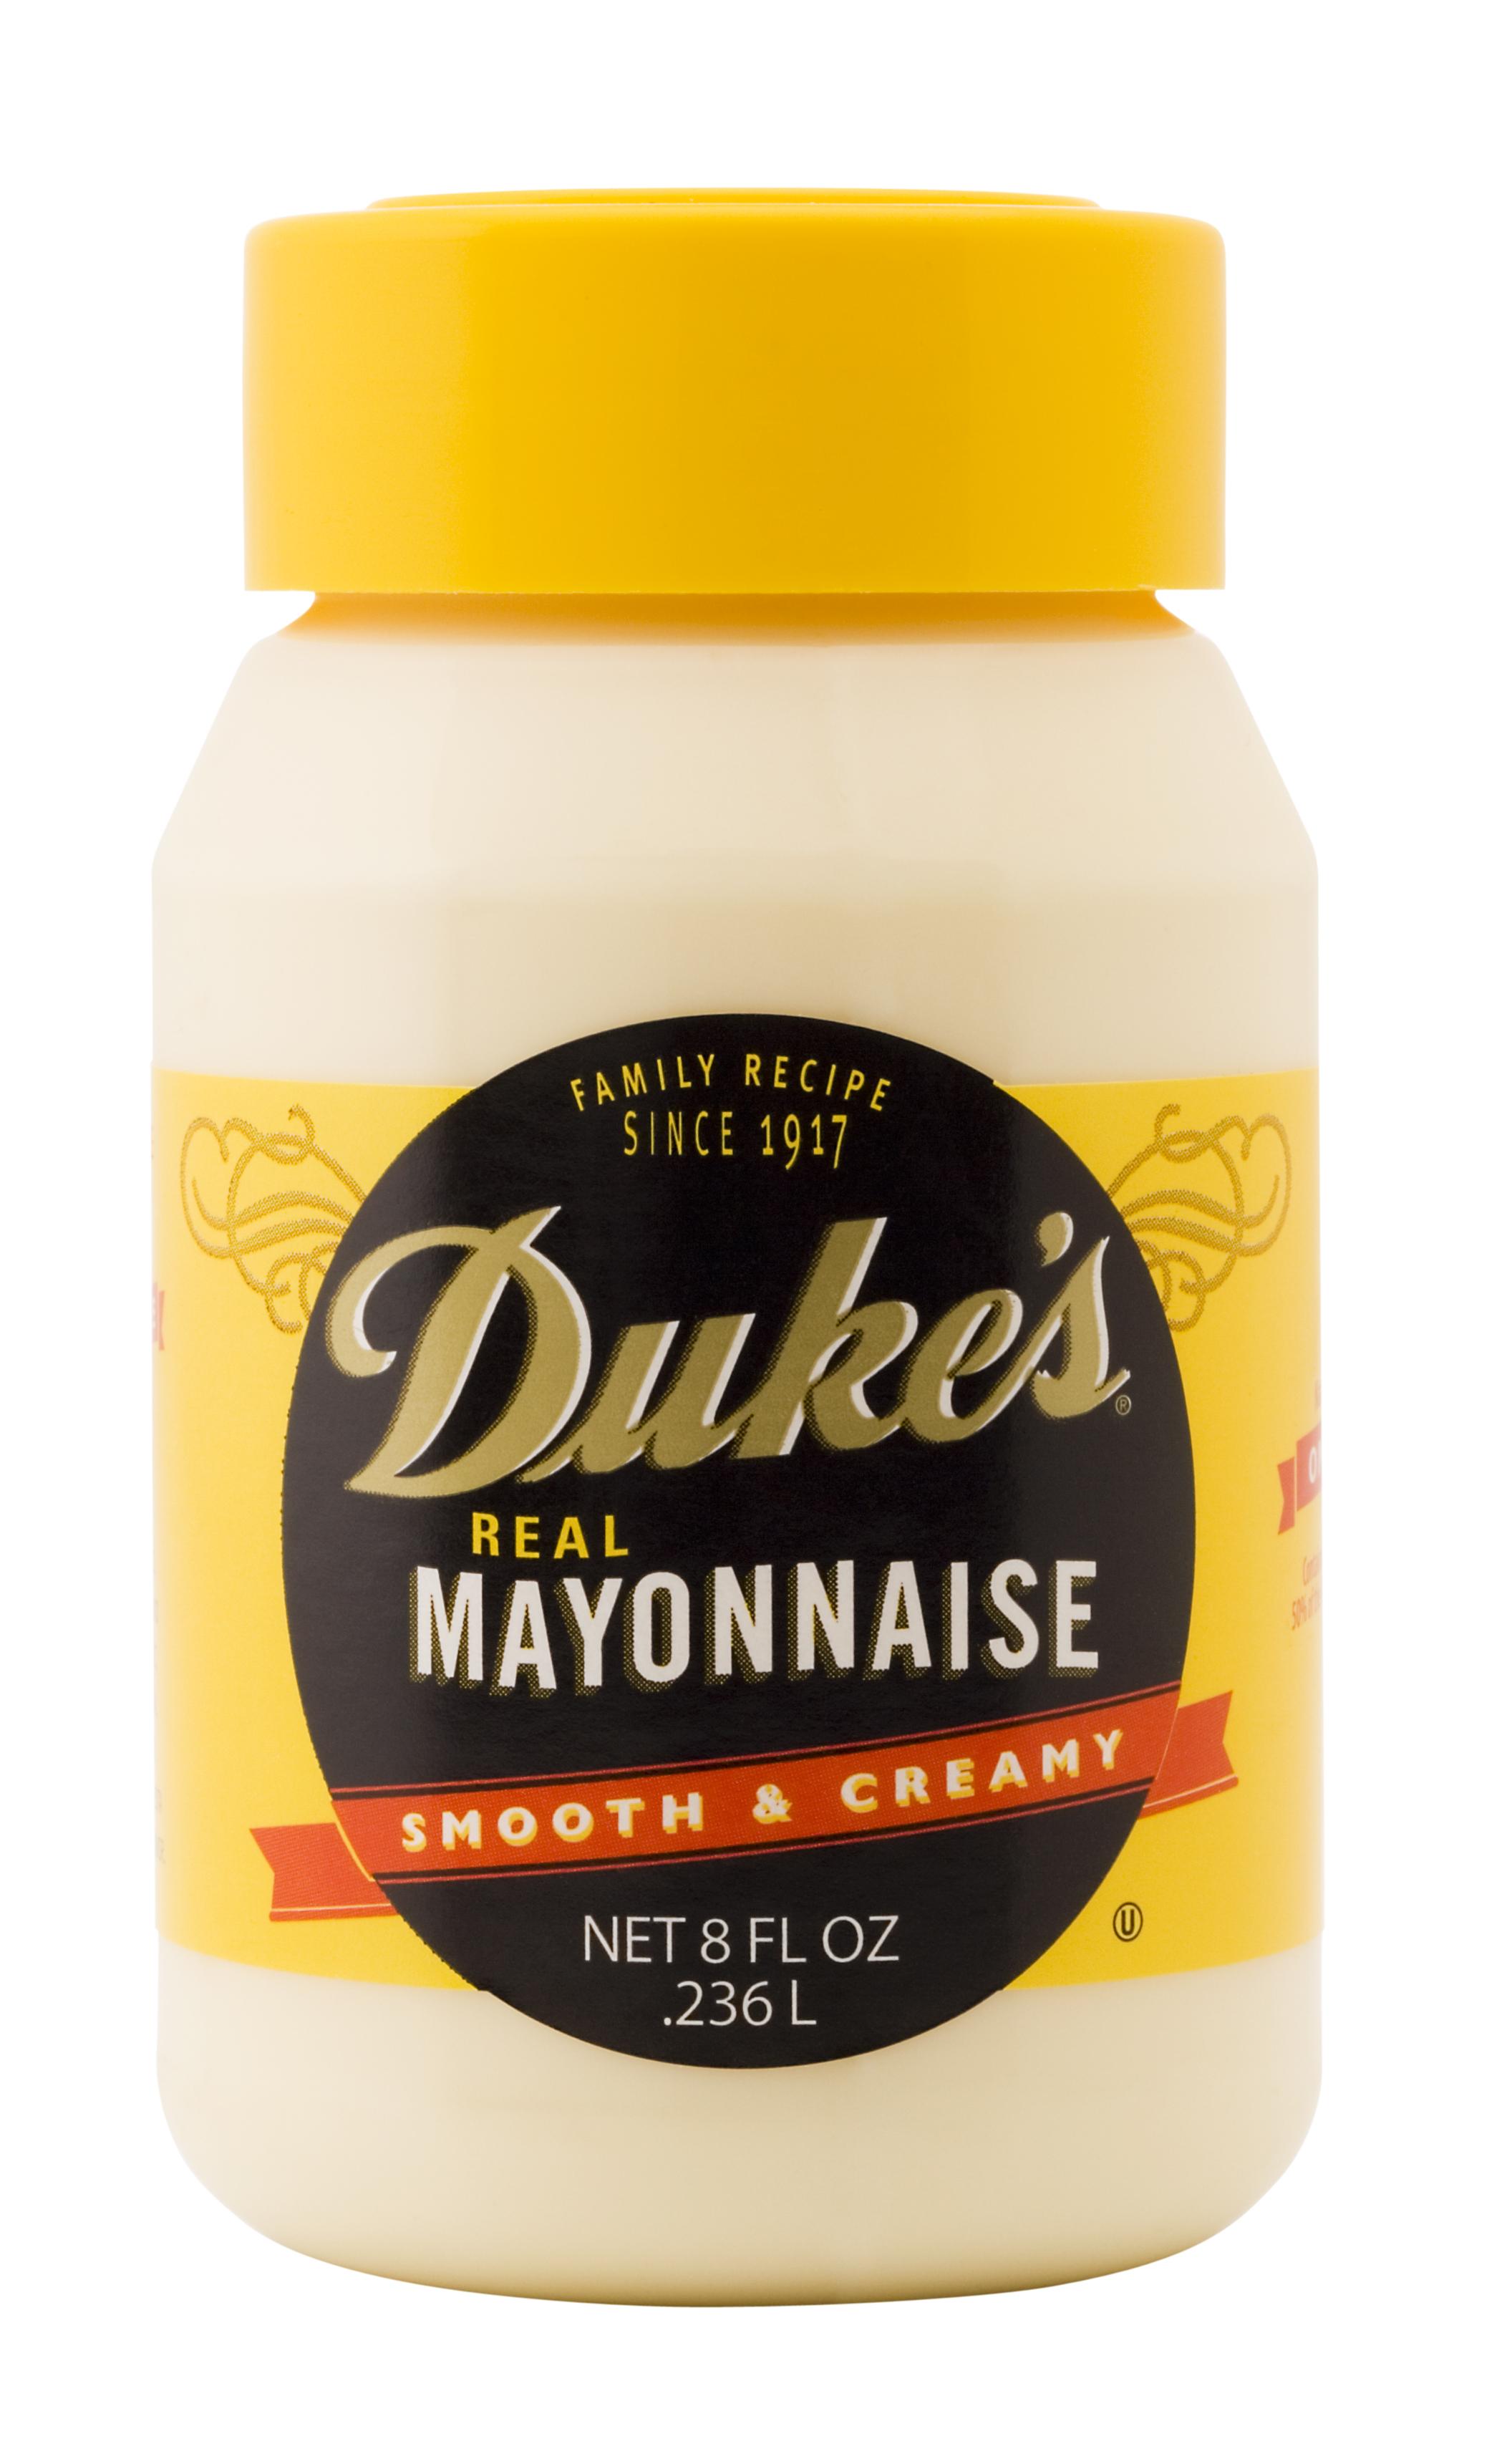 Mayonnaise And Egg Hair Treatment For Natural Hair